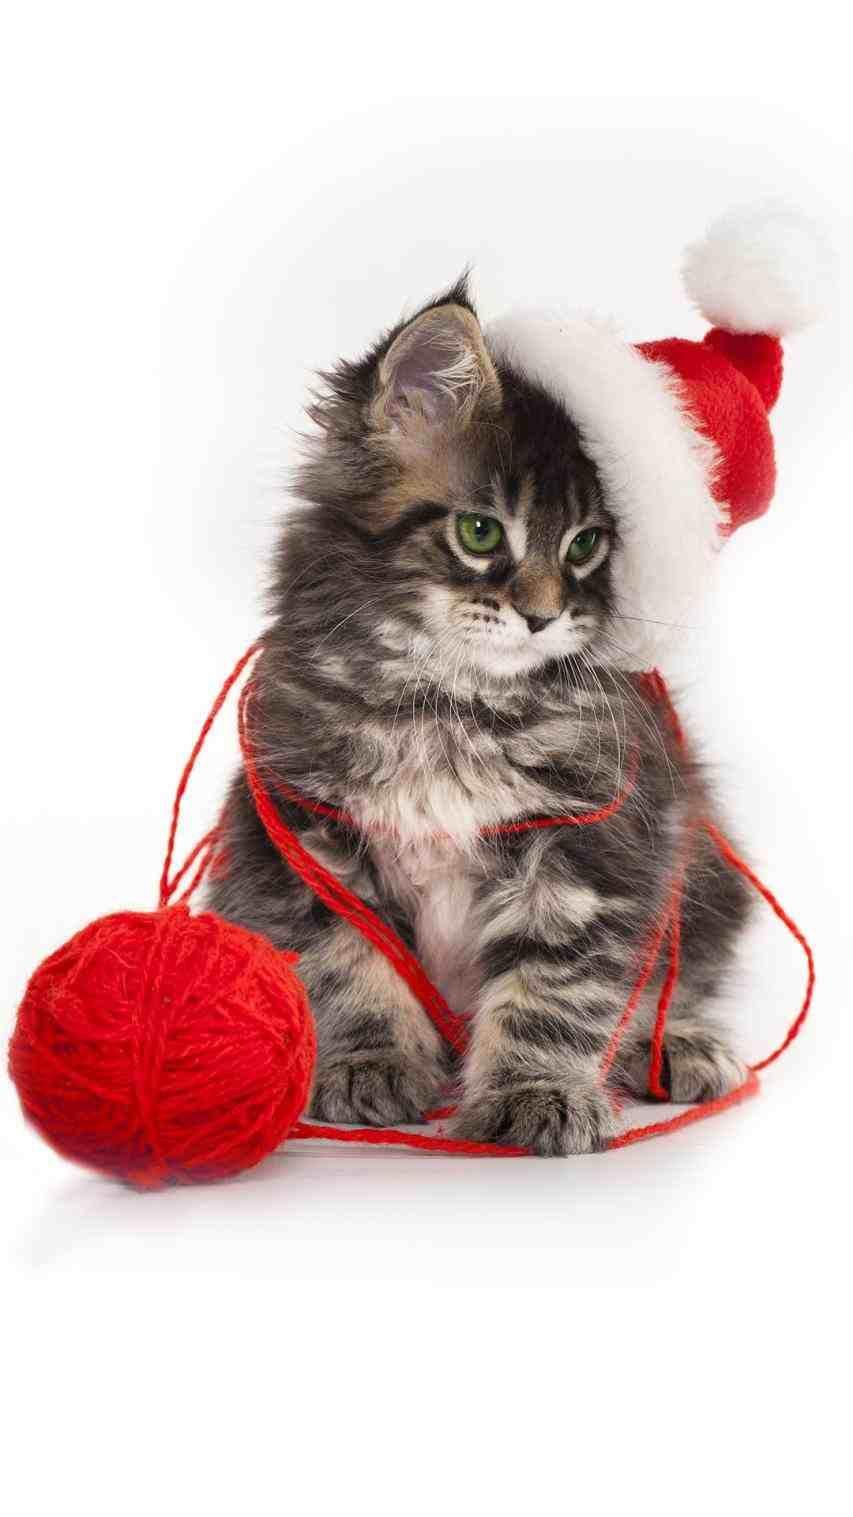 New Christmas Kittens Wallpaper At Temasistemi Net Christmas Kitten Kitten Wallpaper Christmas Pet Photos